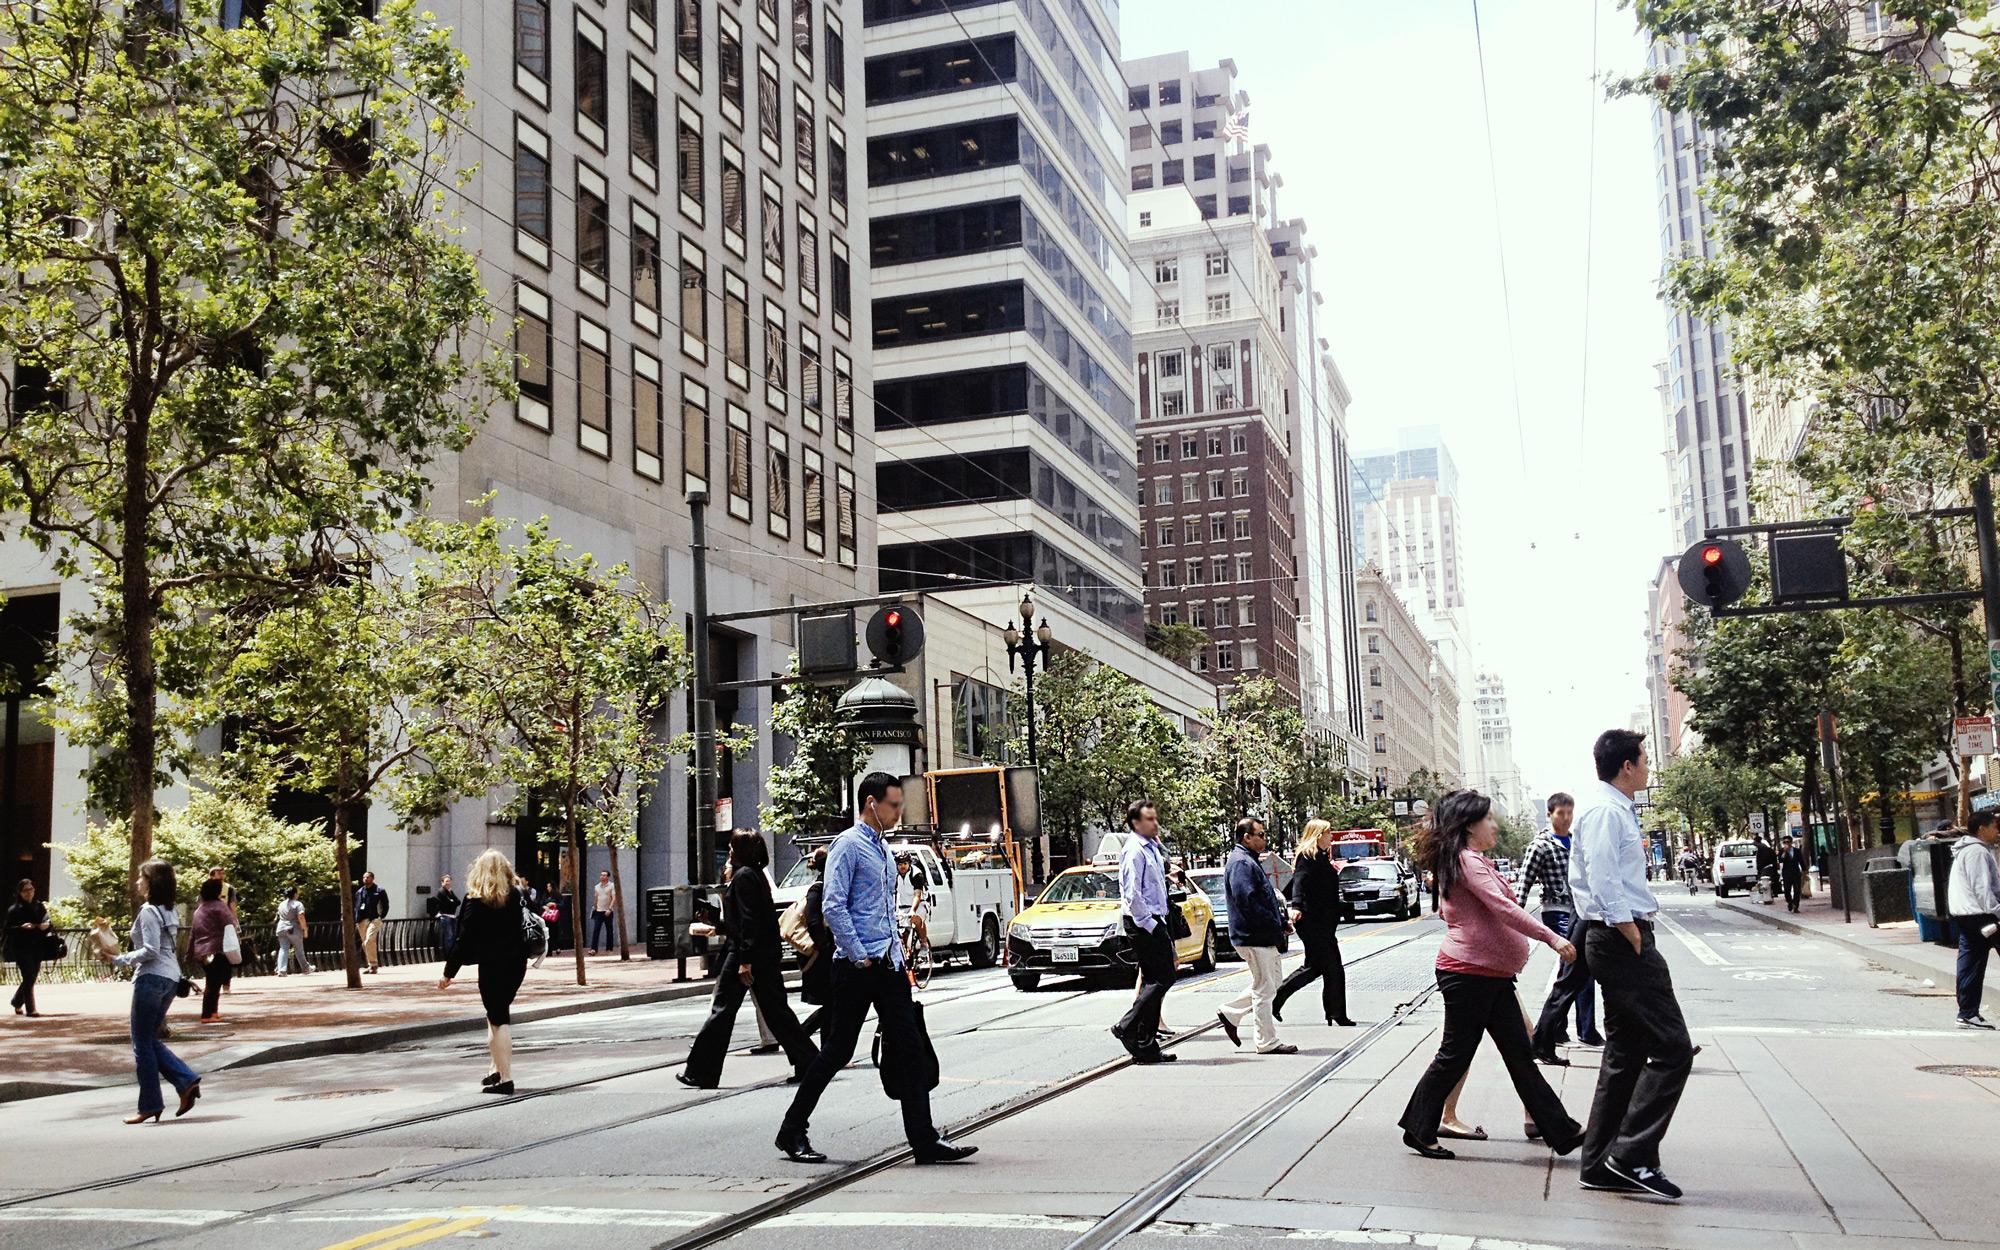 Straßenszene in San Francisco - Foto: Charis Stank